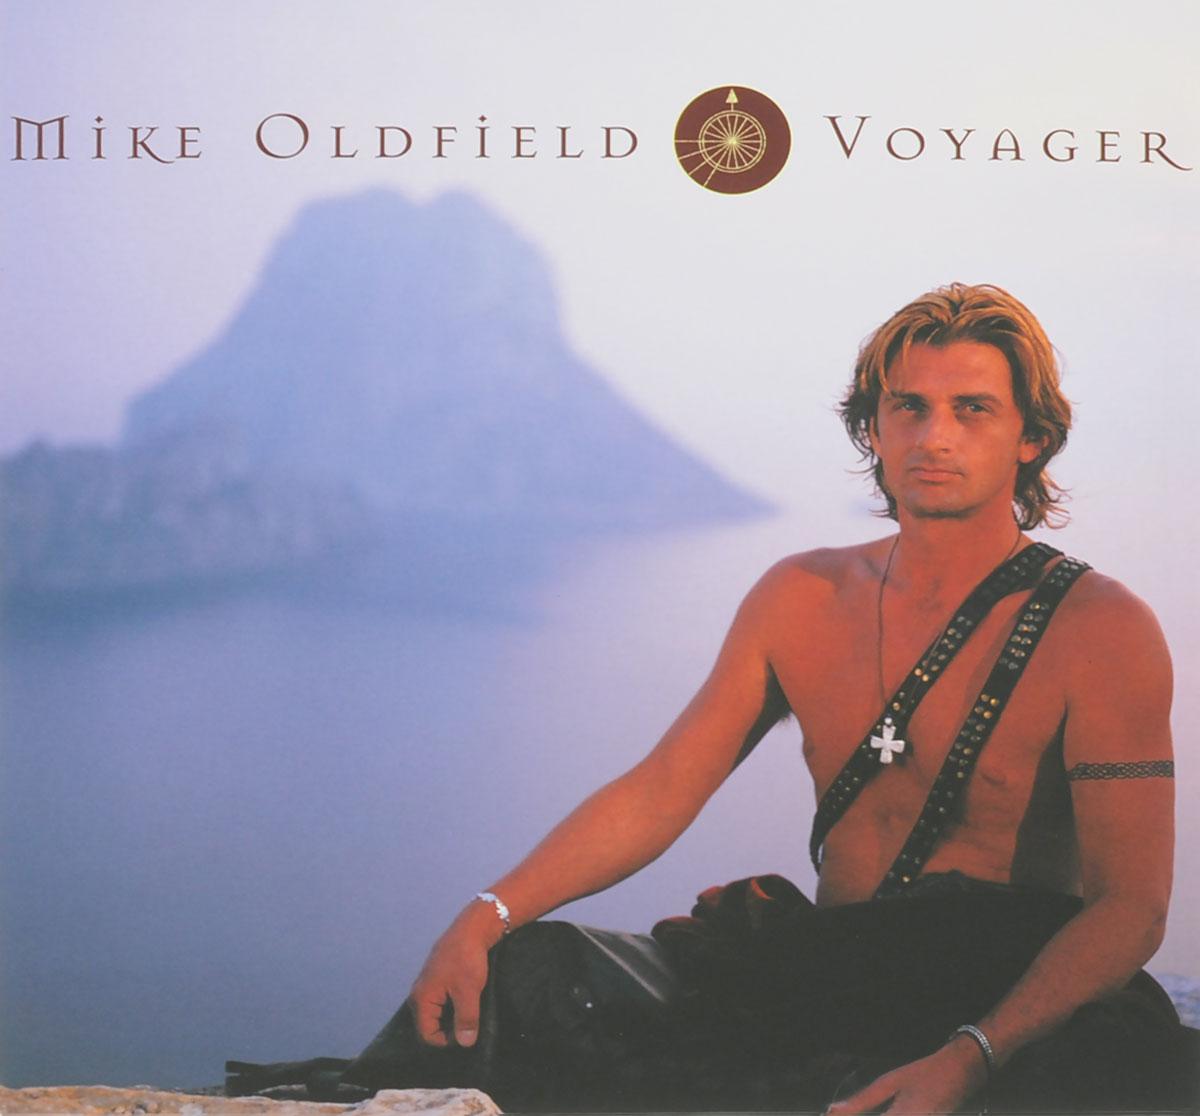 Майк Олдфилд Mike Oldfield. Voyager (LP) майк олдфилд mike oldfield hergest ridge deluxe edition 2 cd dvd